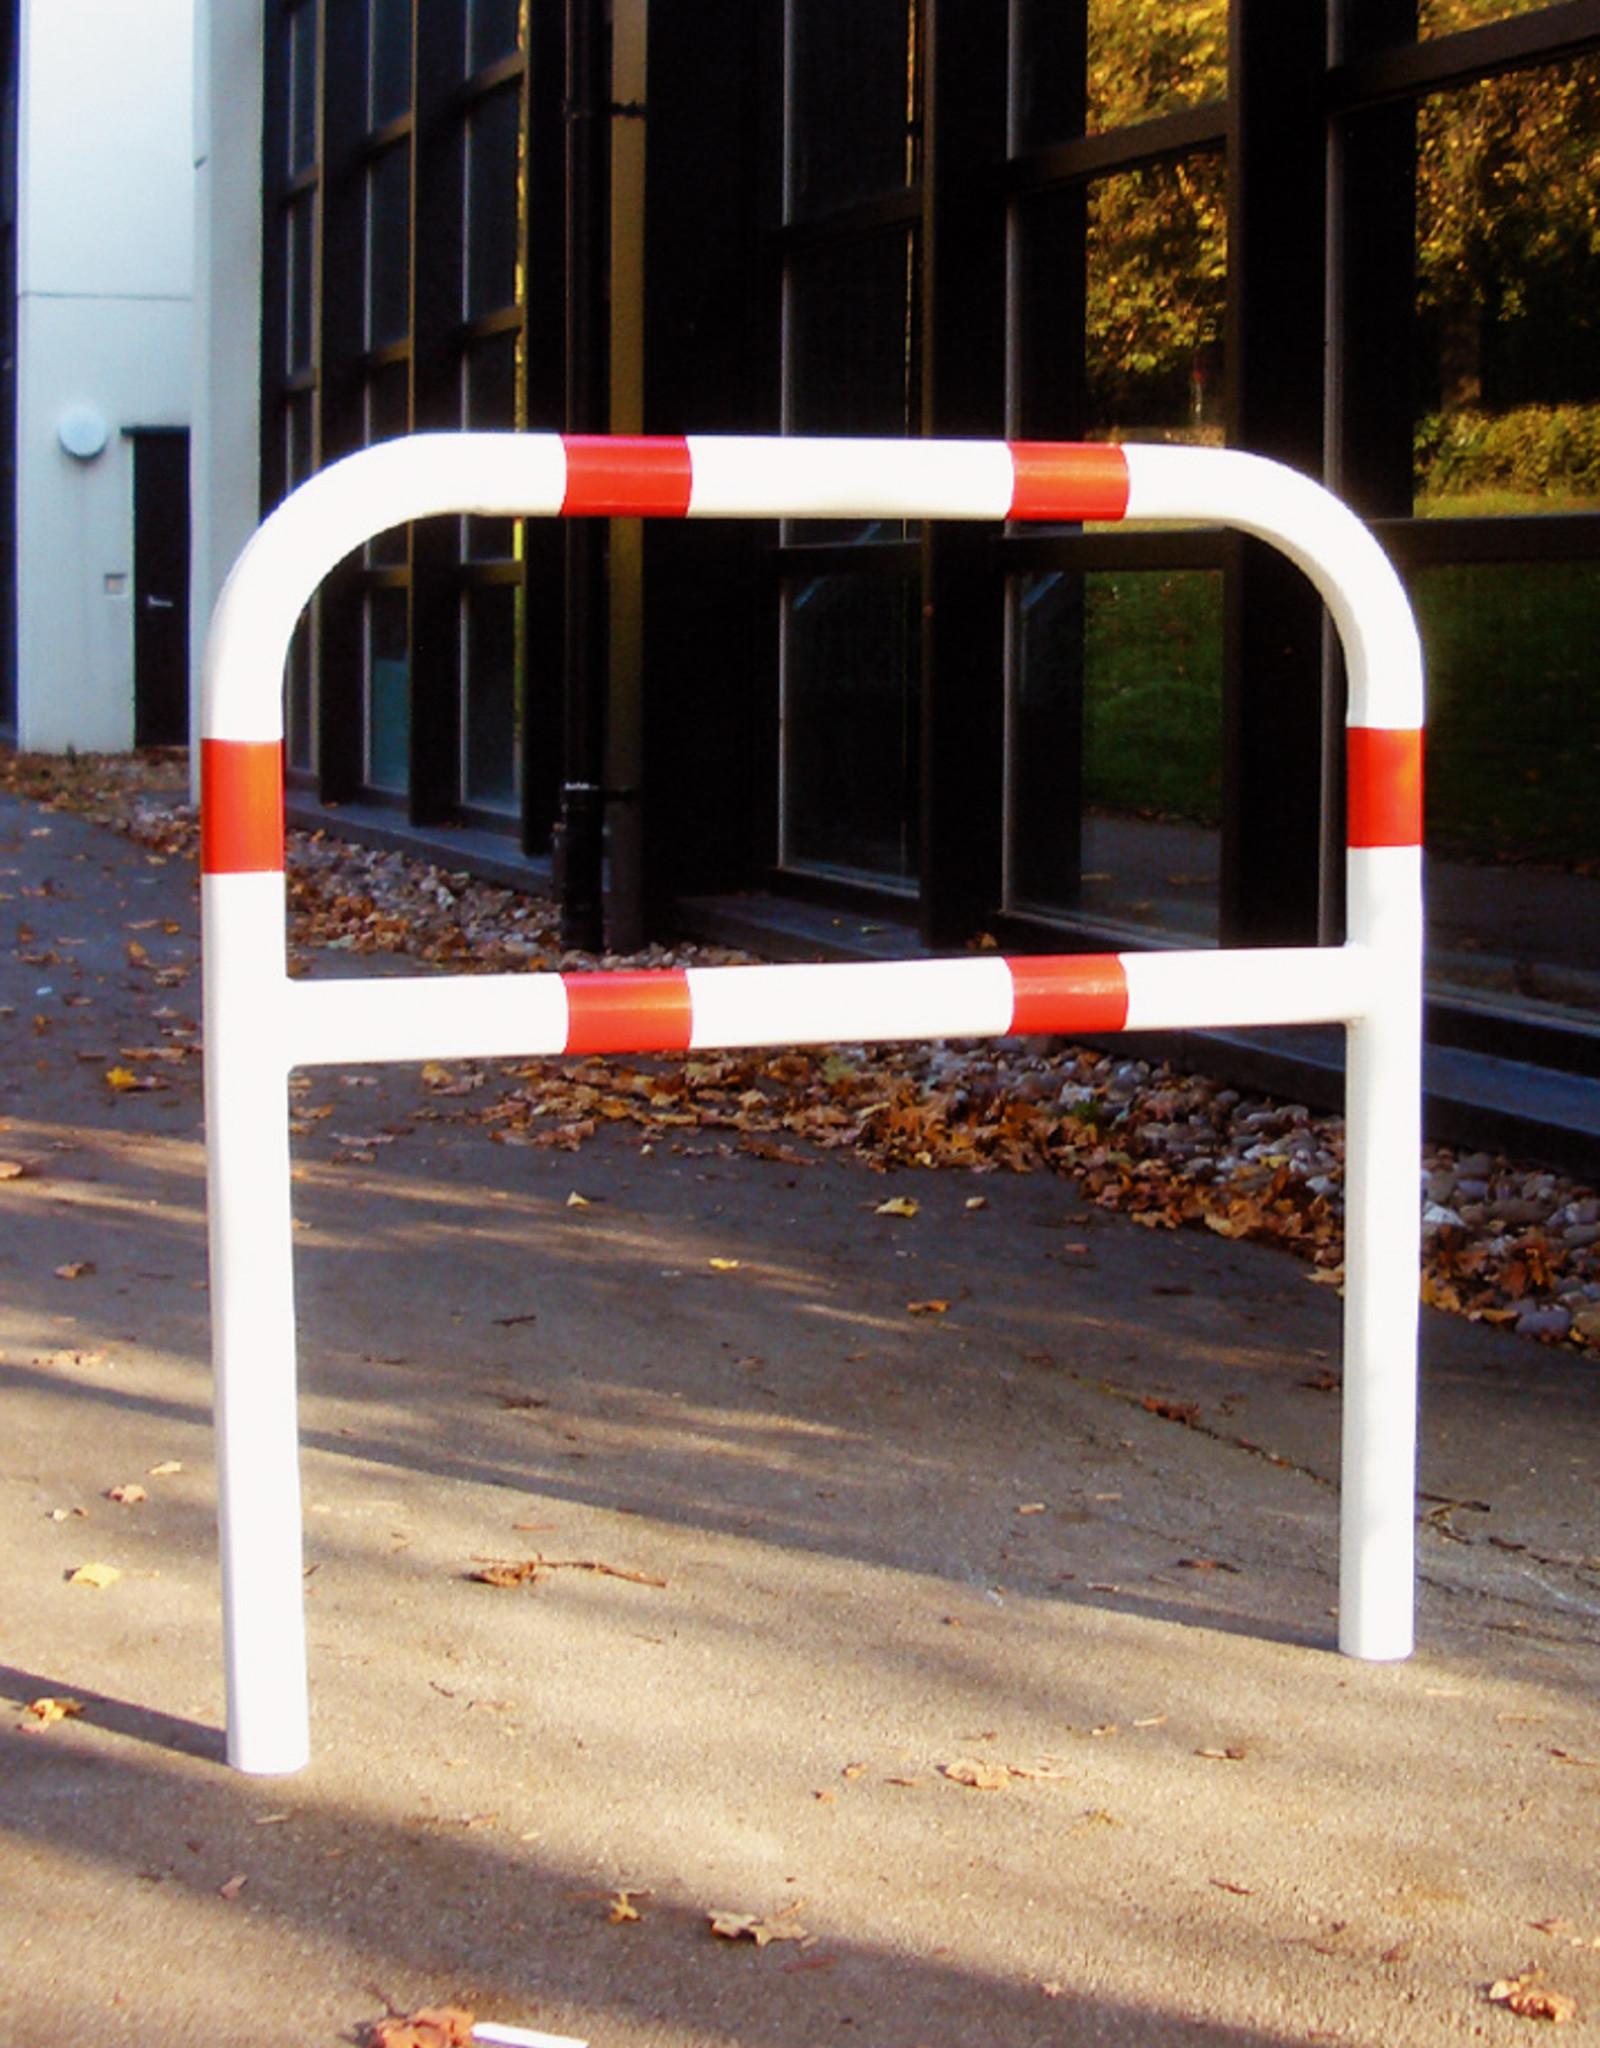 Ri-Traffic | Voetgangerssluis Staal, Rood-Wit, 70 cm x 120 cm